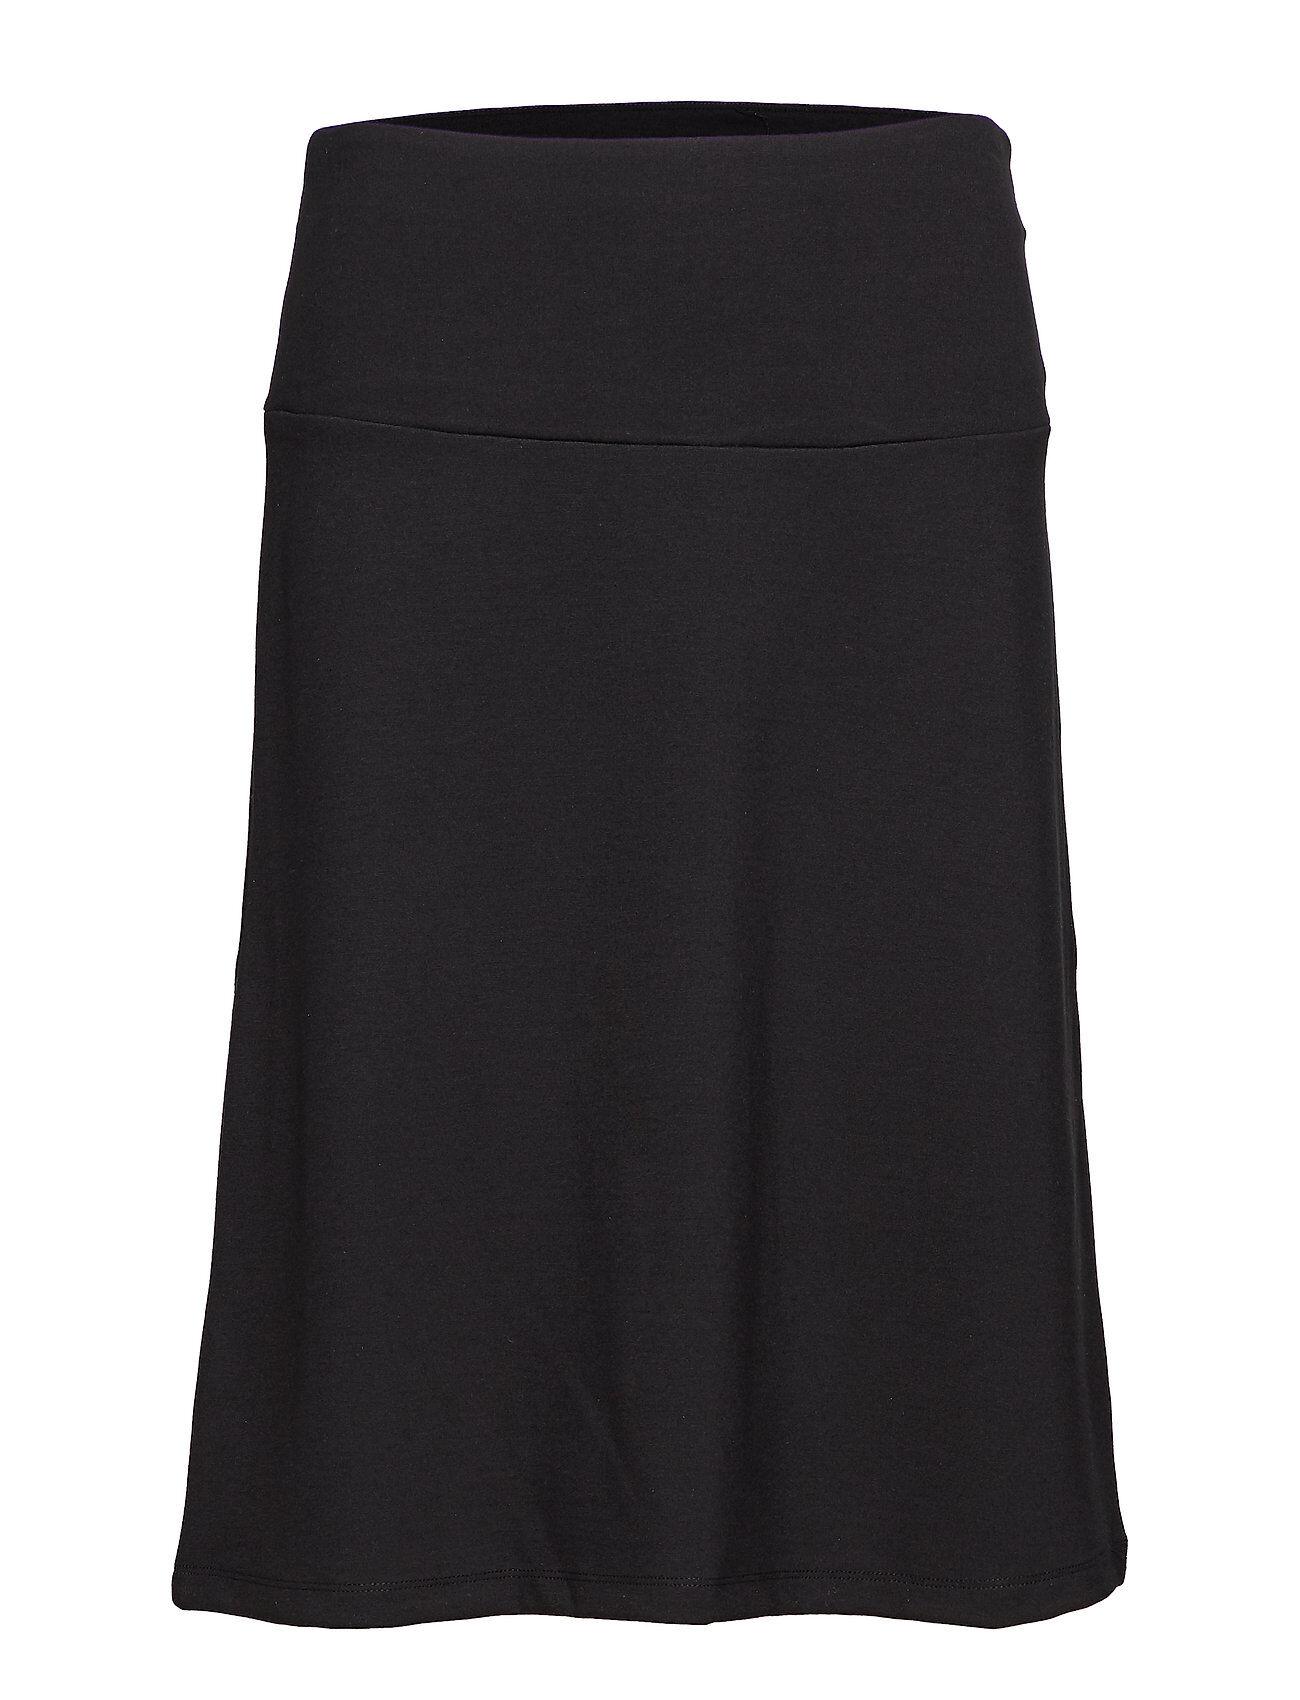 Nanso Ladies Skirt, Bella